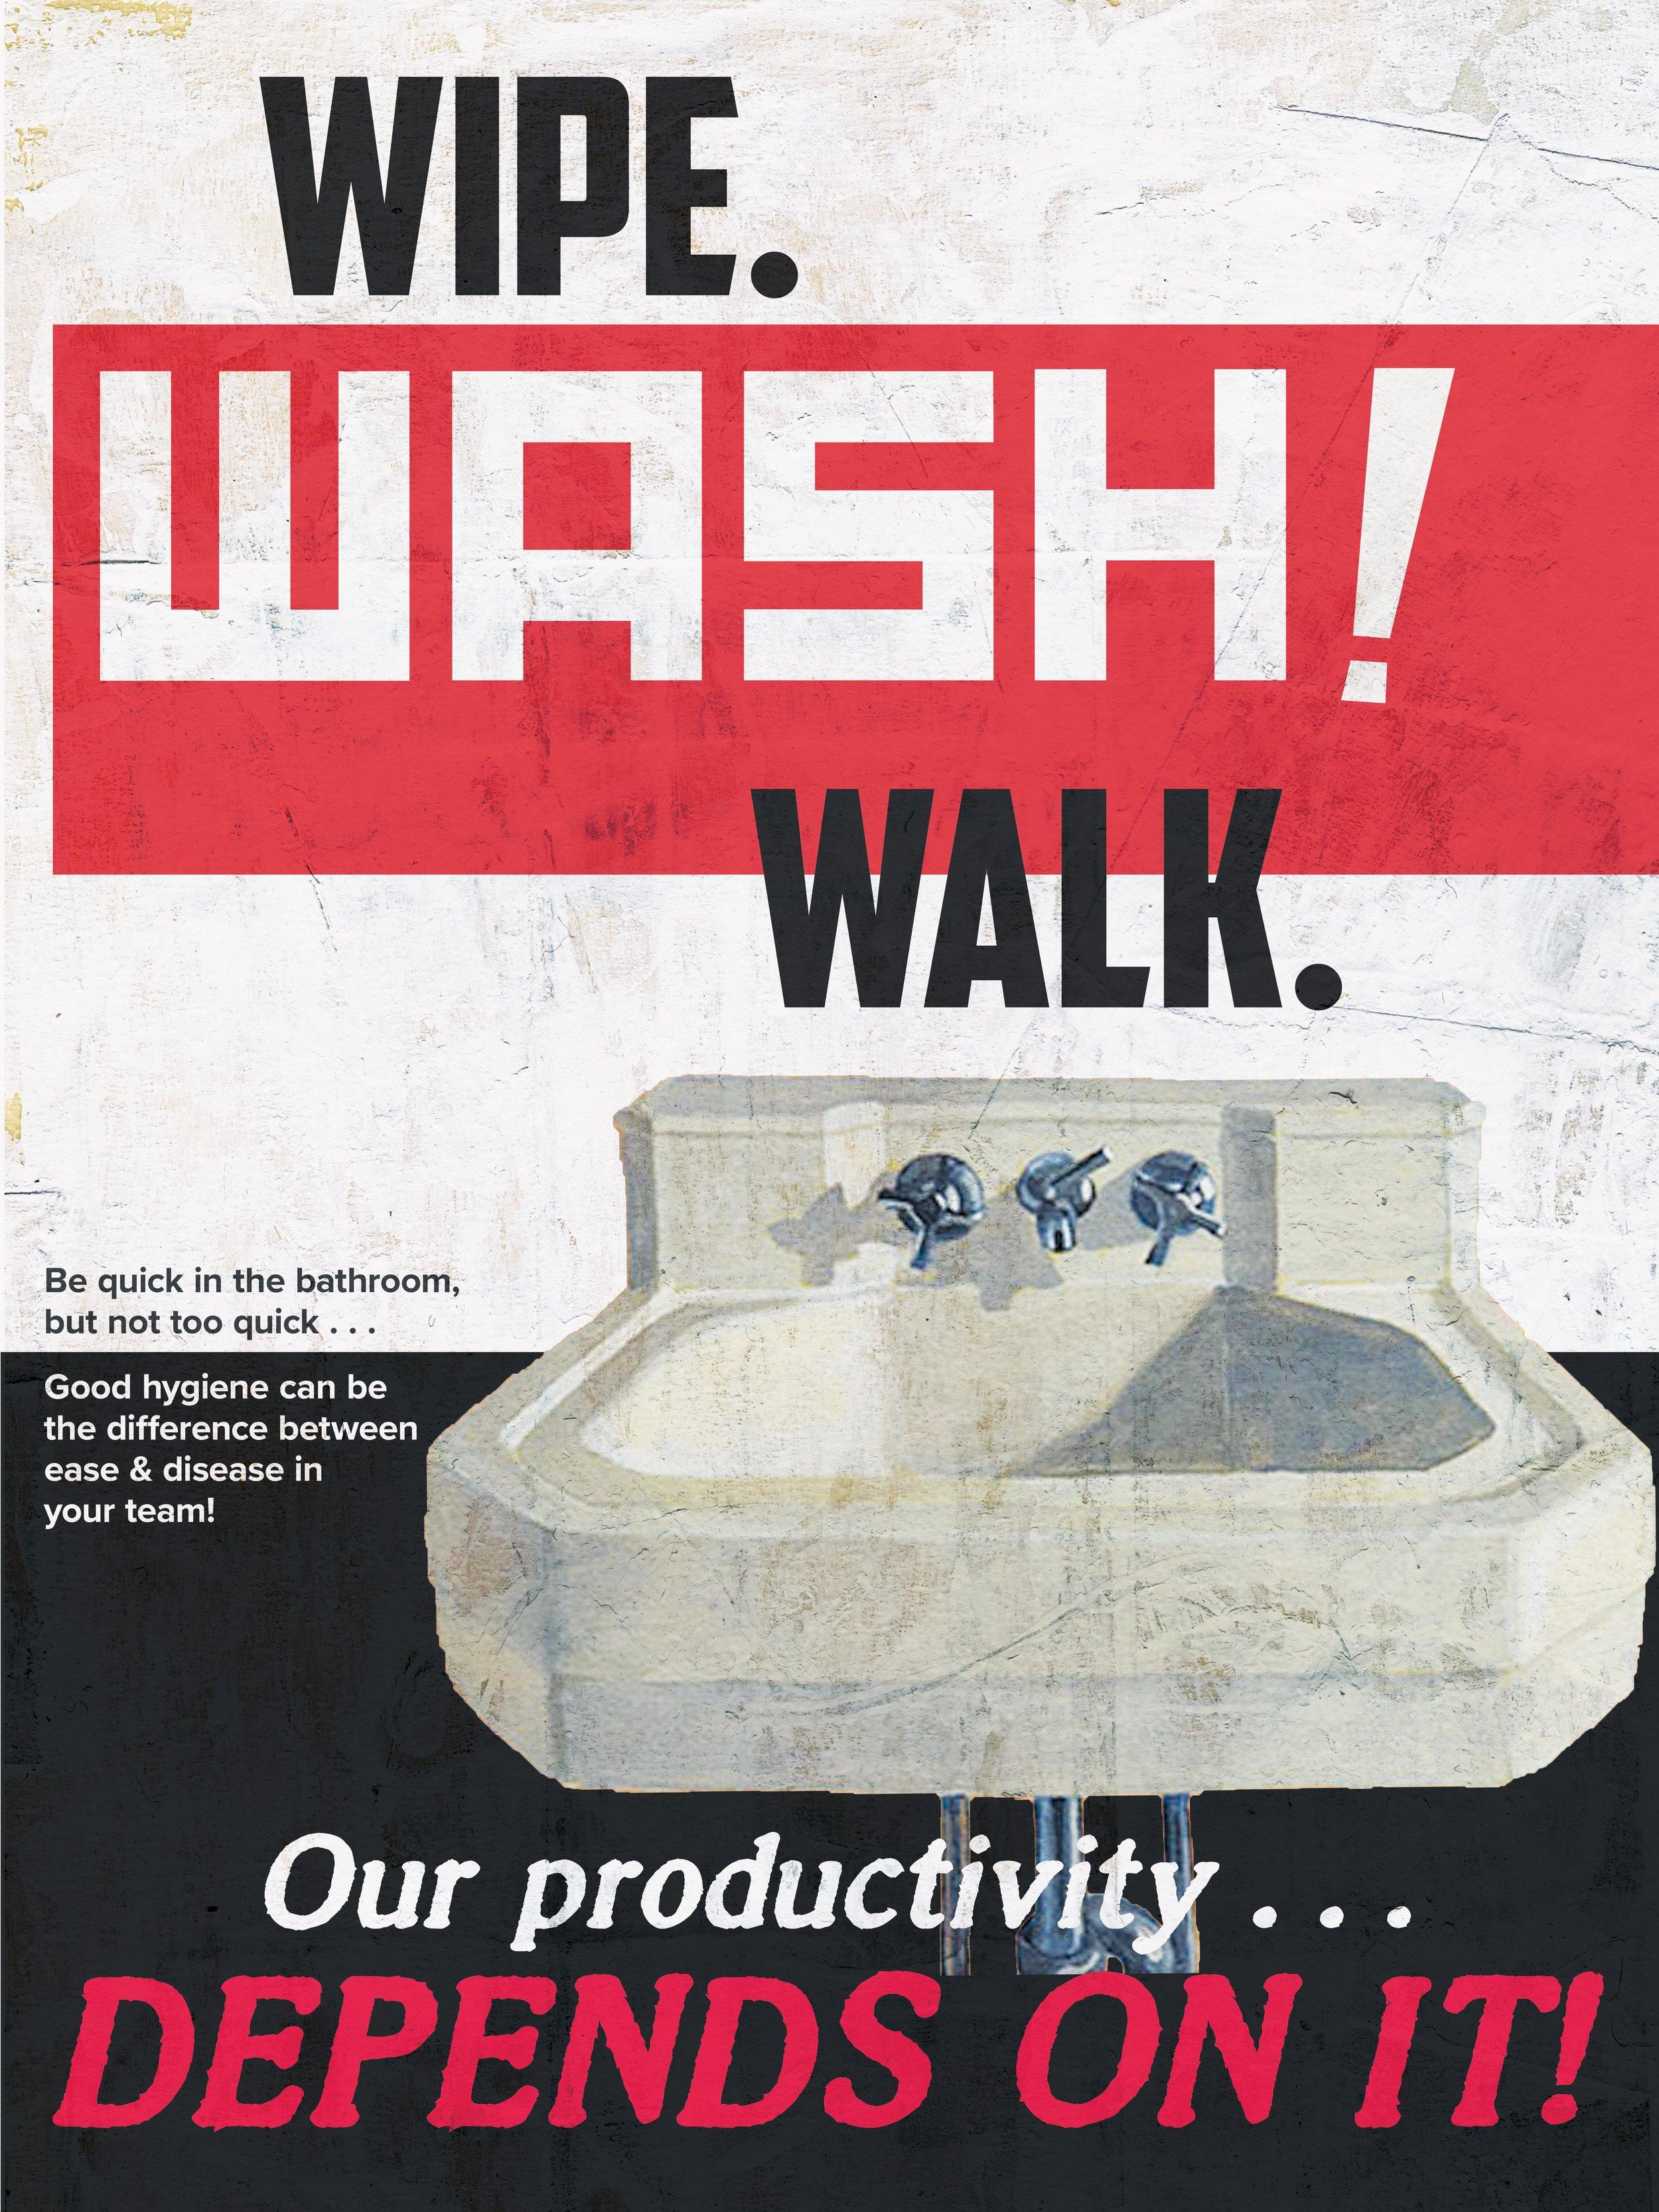 WipeWashWalk.jpg